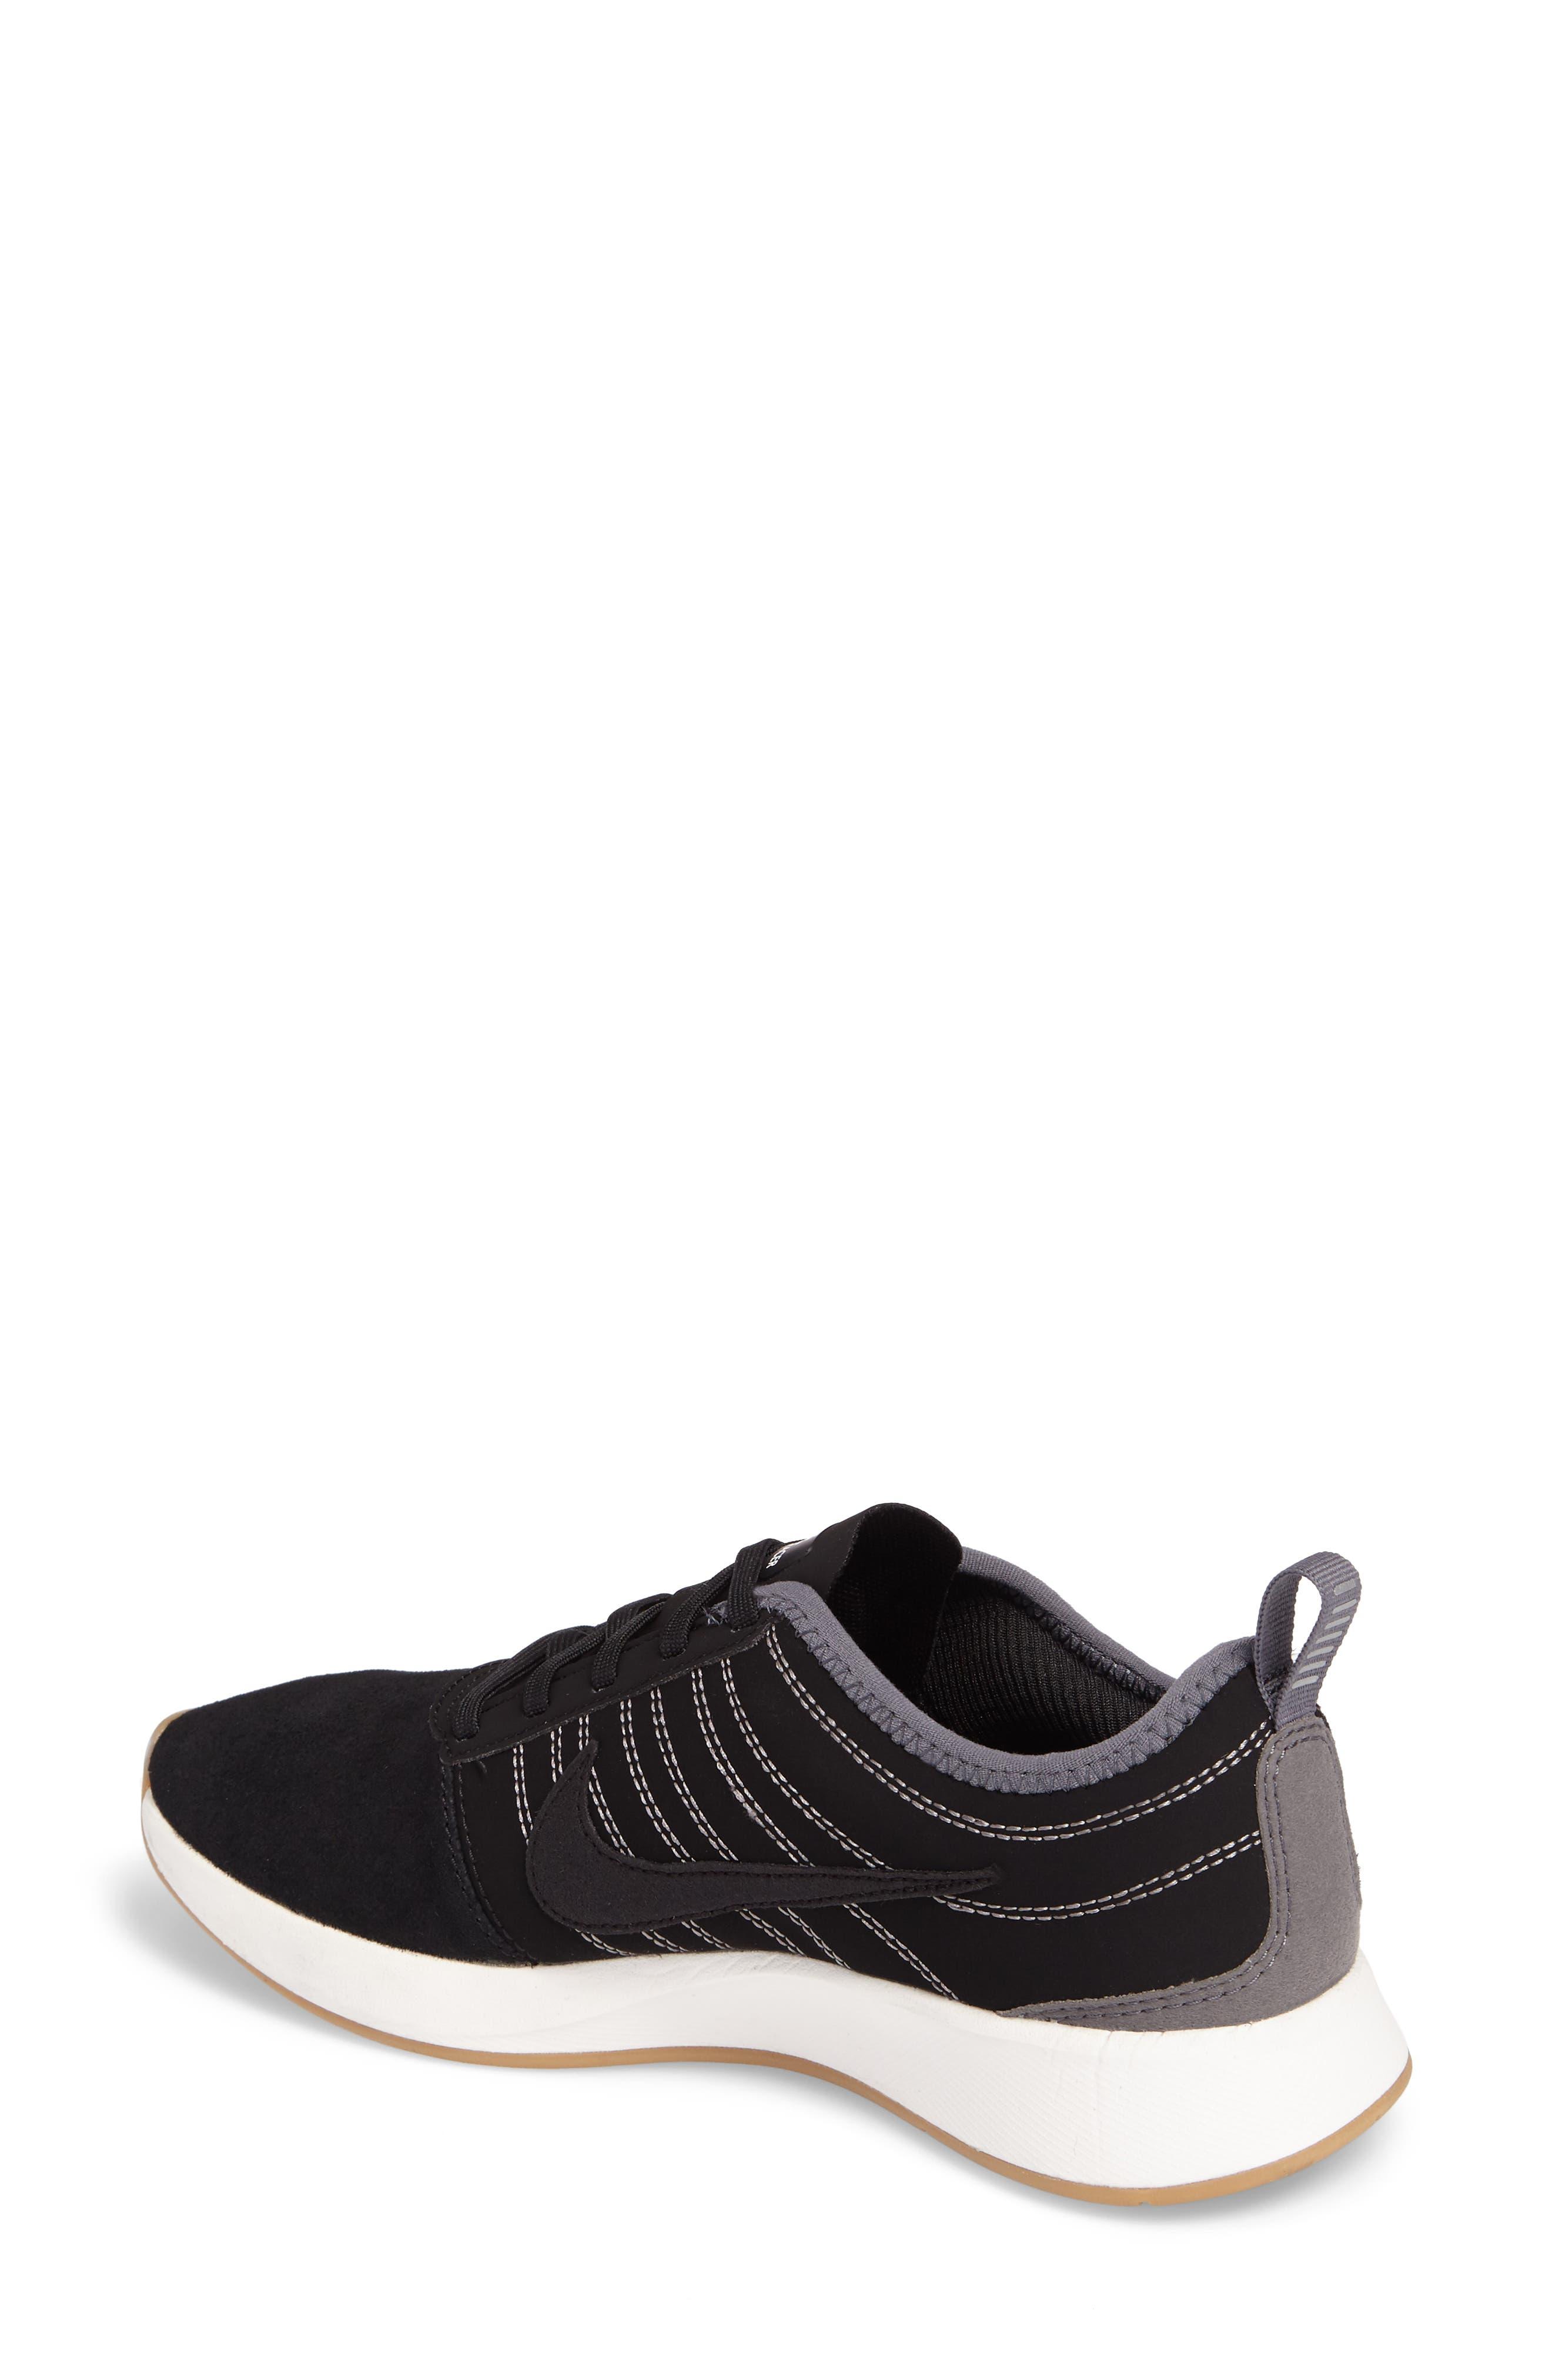 Alternate Image 2  - Nike Dualtone Racer SE Sneaker (Women)